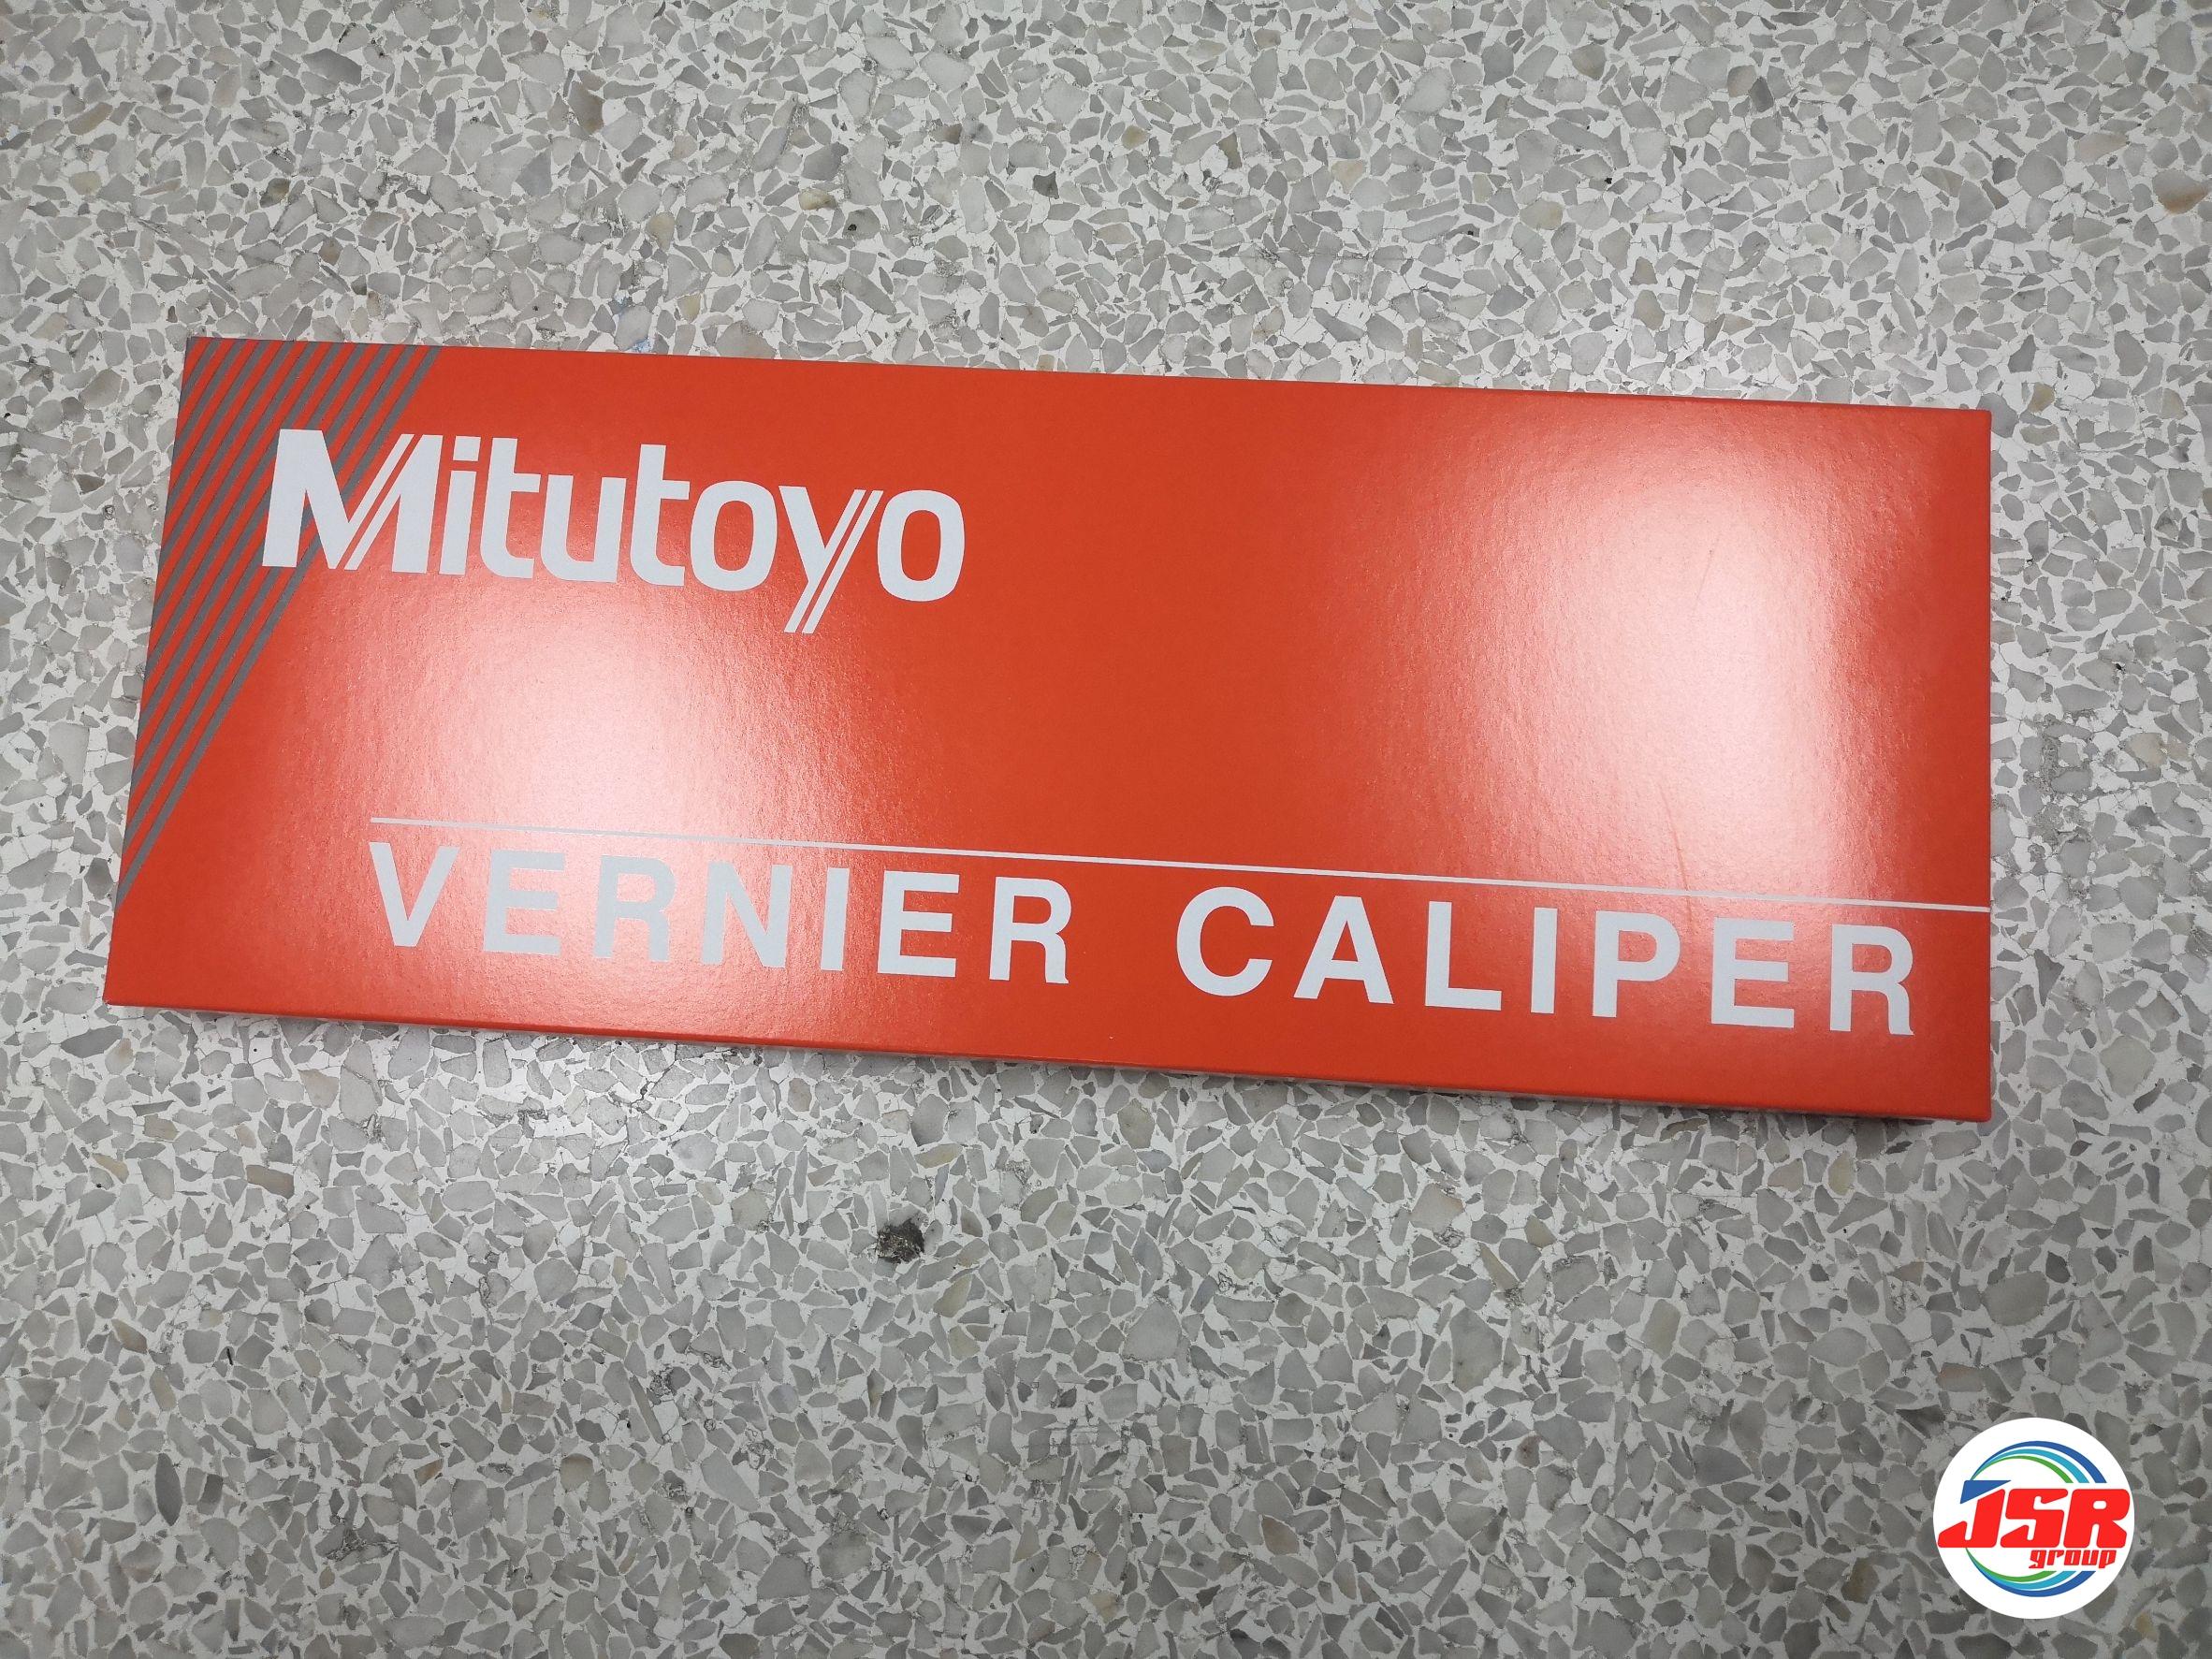 vernier caliper 530